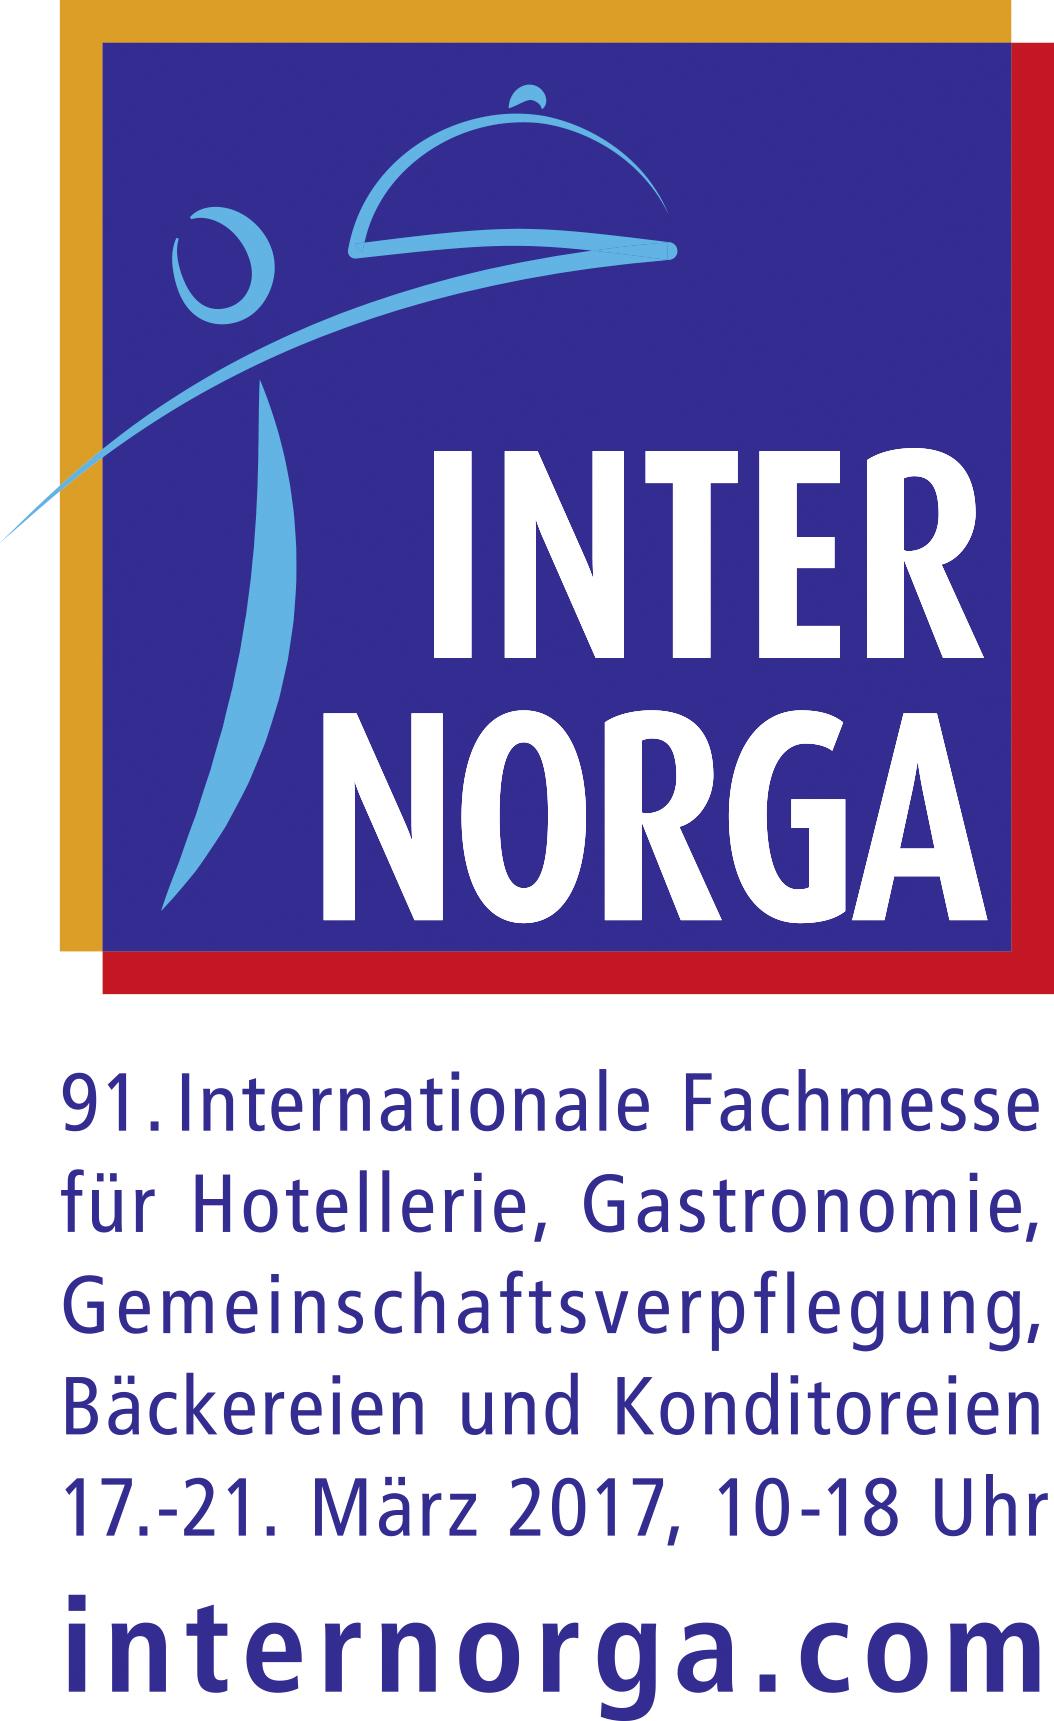 INTERNORGA 2017